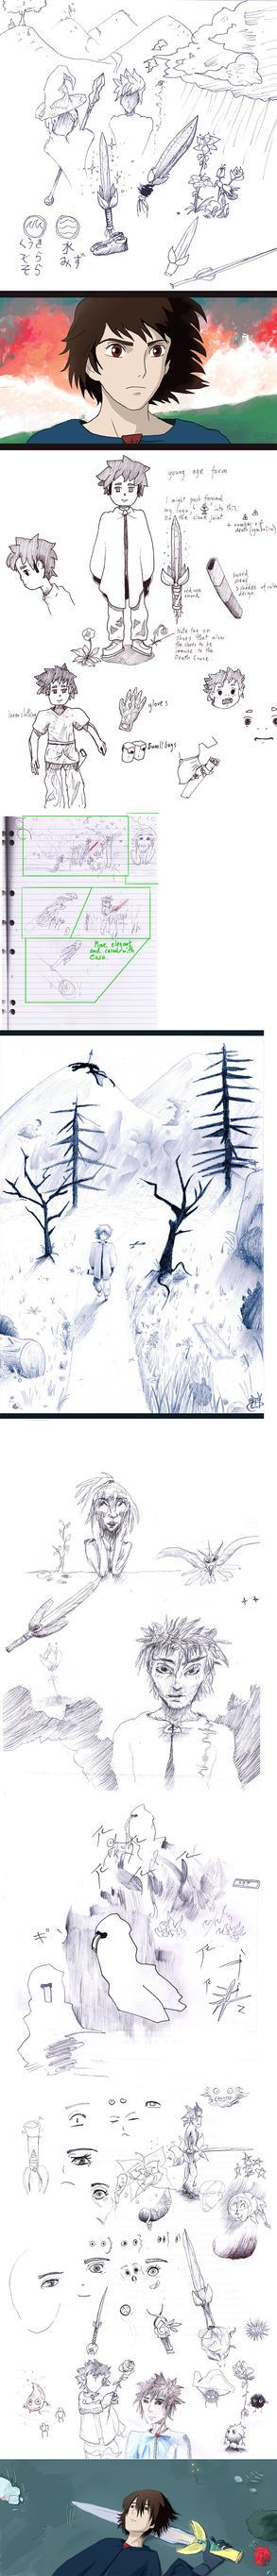 Concept Art Group 1. Air or Water by eltoNNNNNN